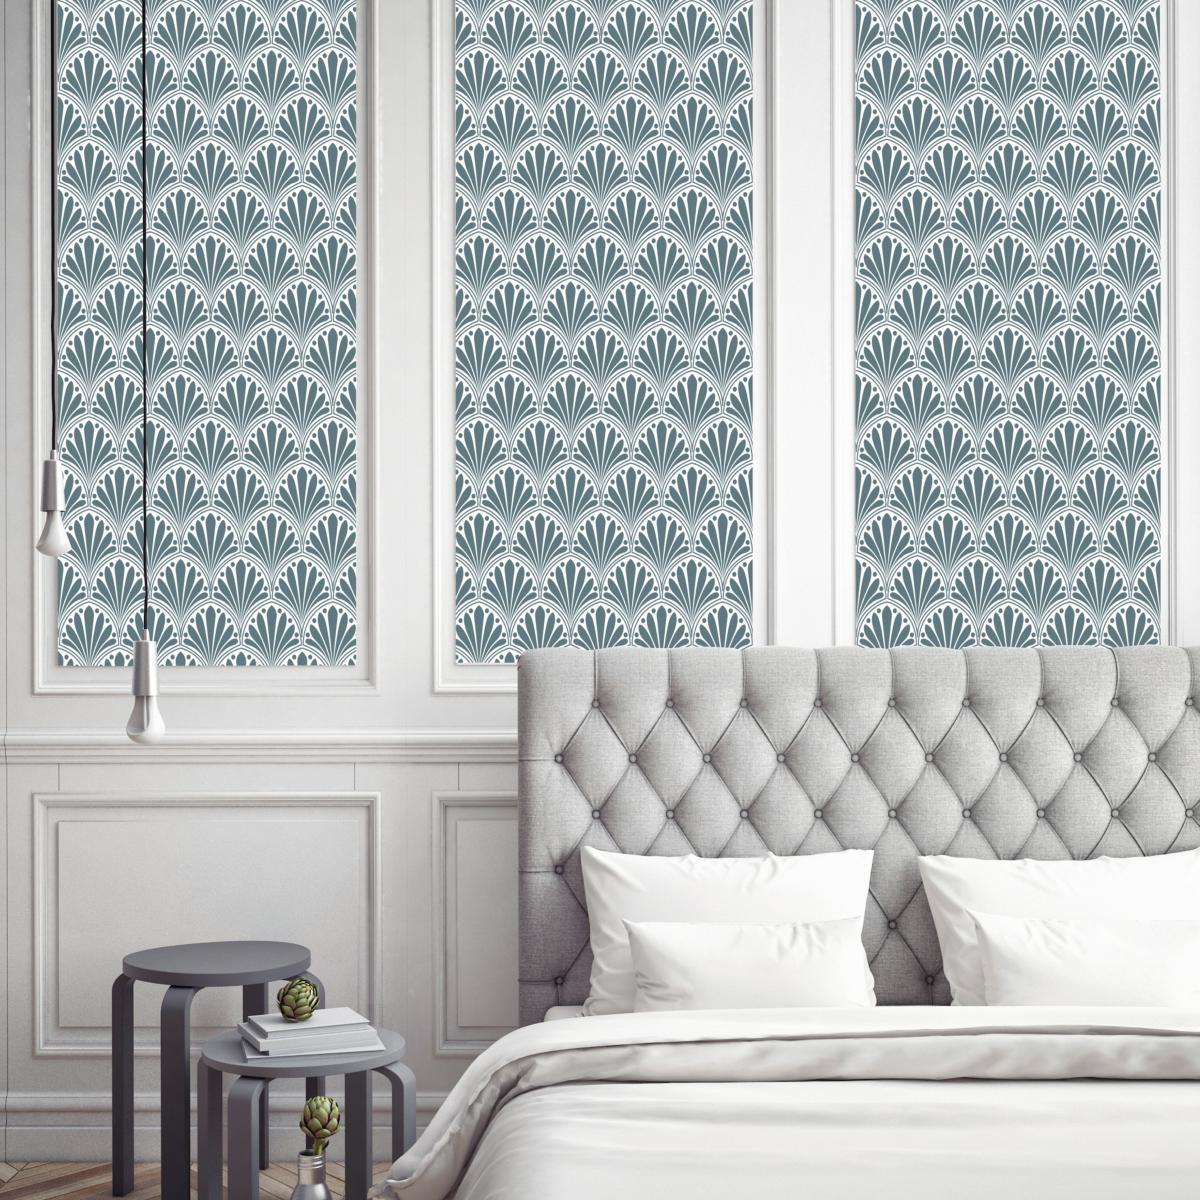 tapis vinyle carreaux de ciment ginette rose. Black Bedroom Furniture Sets. Home Design Ideas